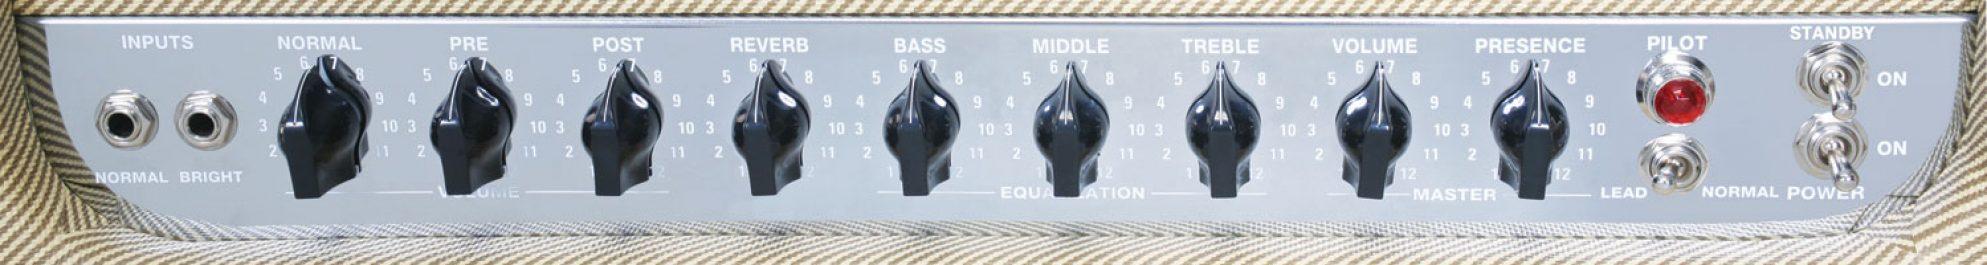 Peavey Classic 50 212 Guitar Amp Combo Panel